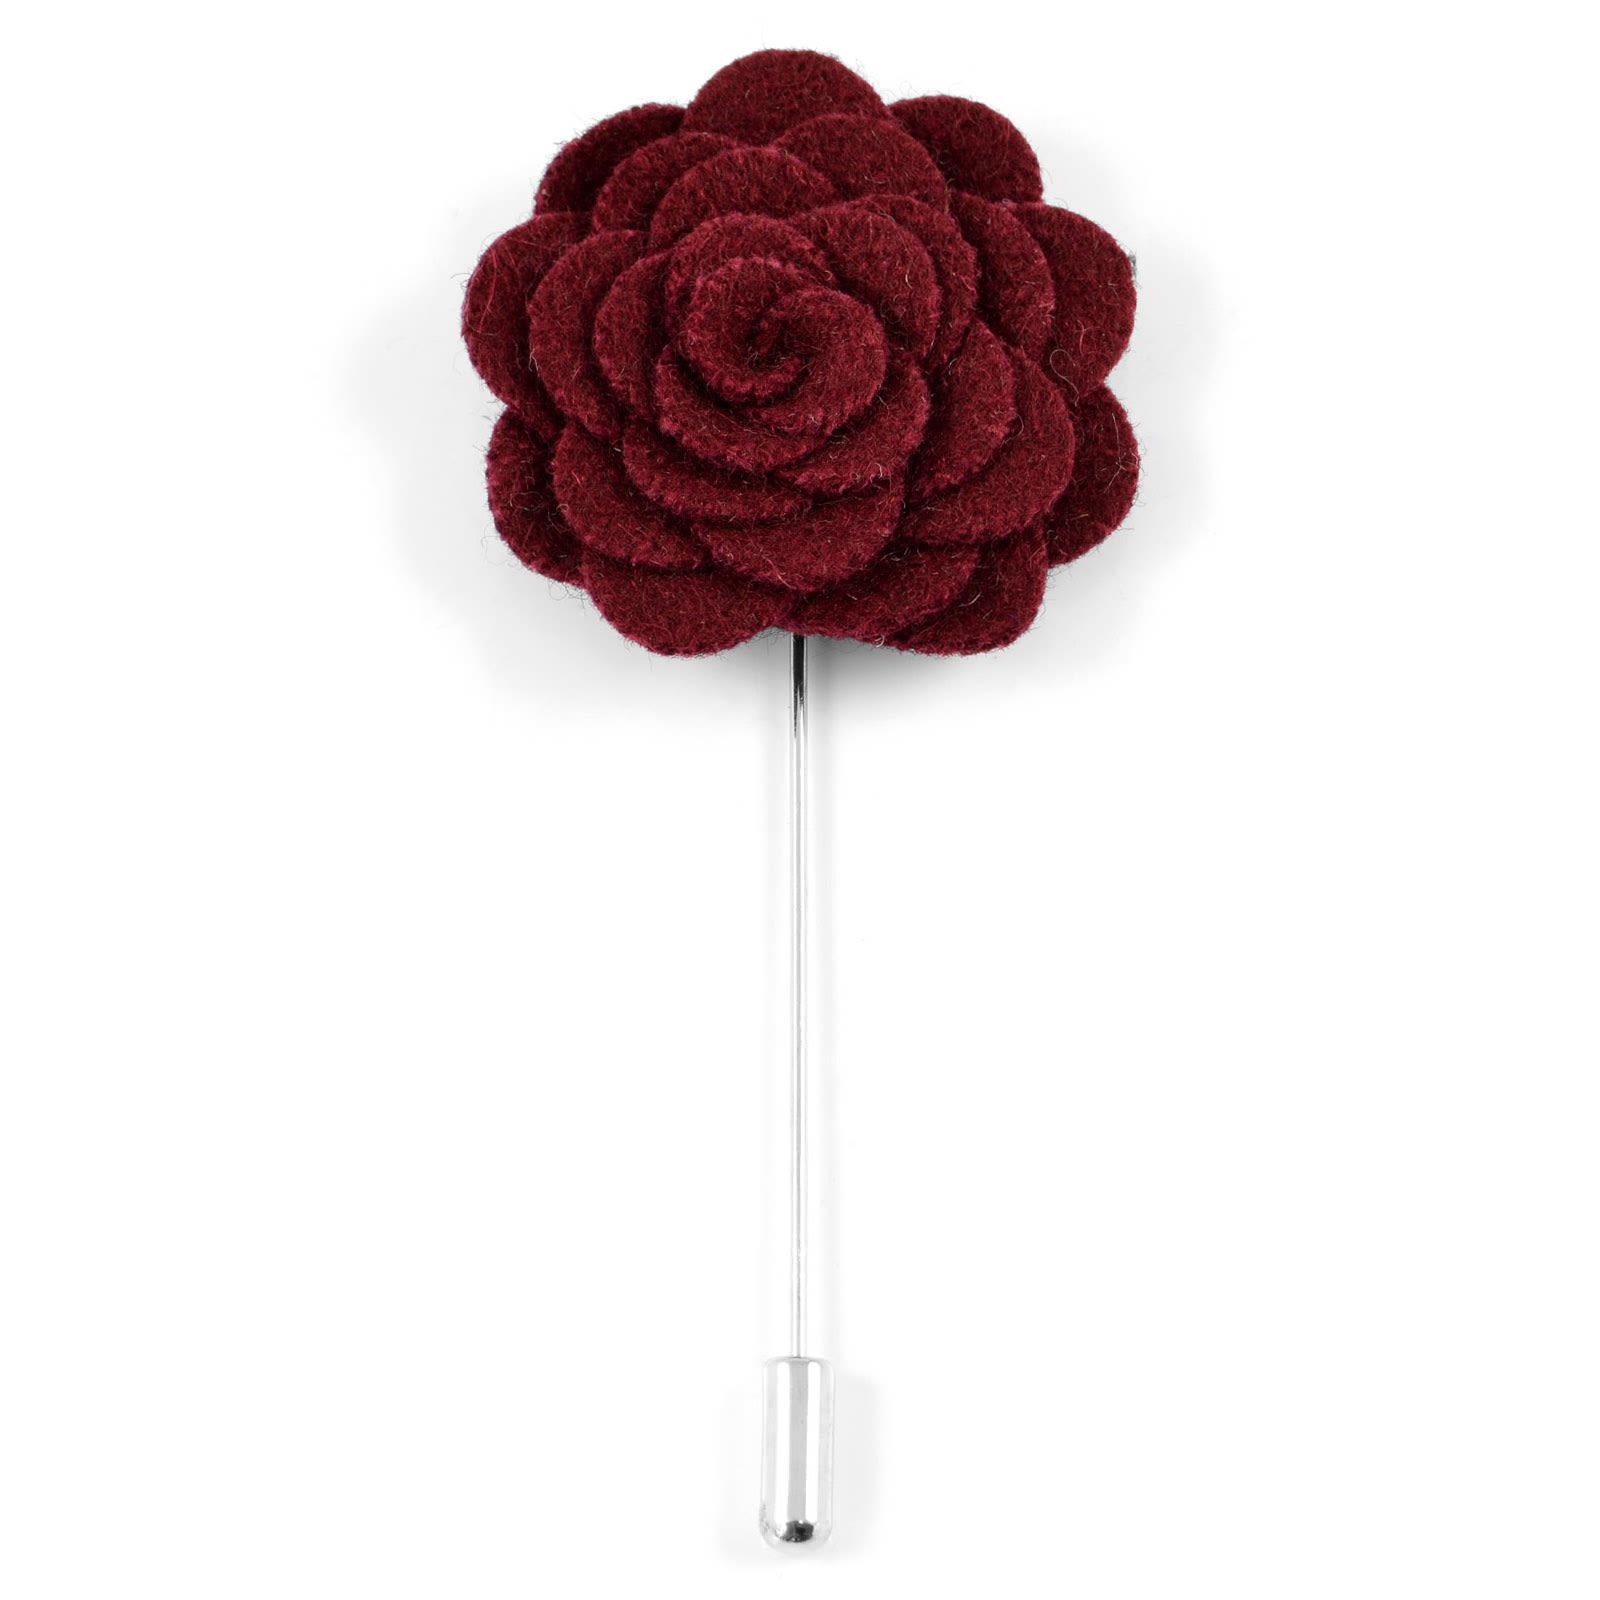 Warren Asher Viininpunainen Rose Rintaneula